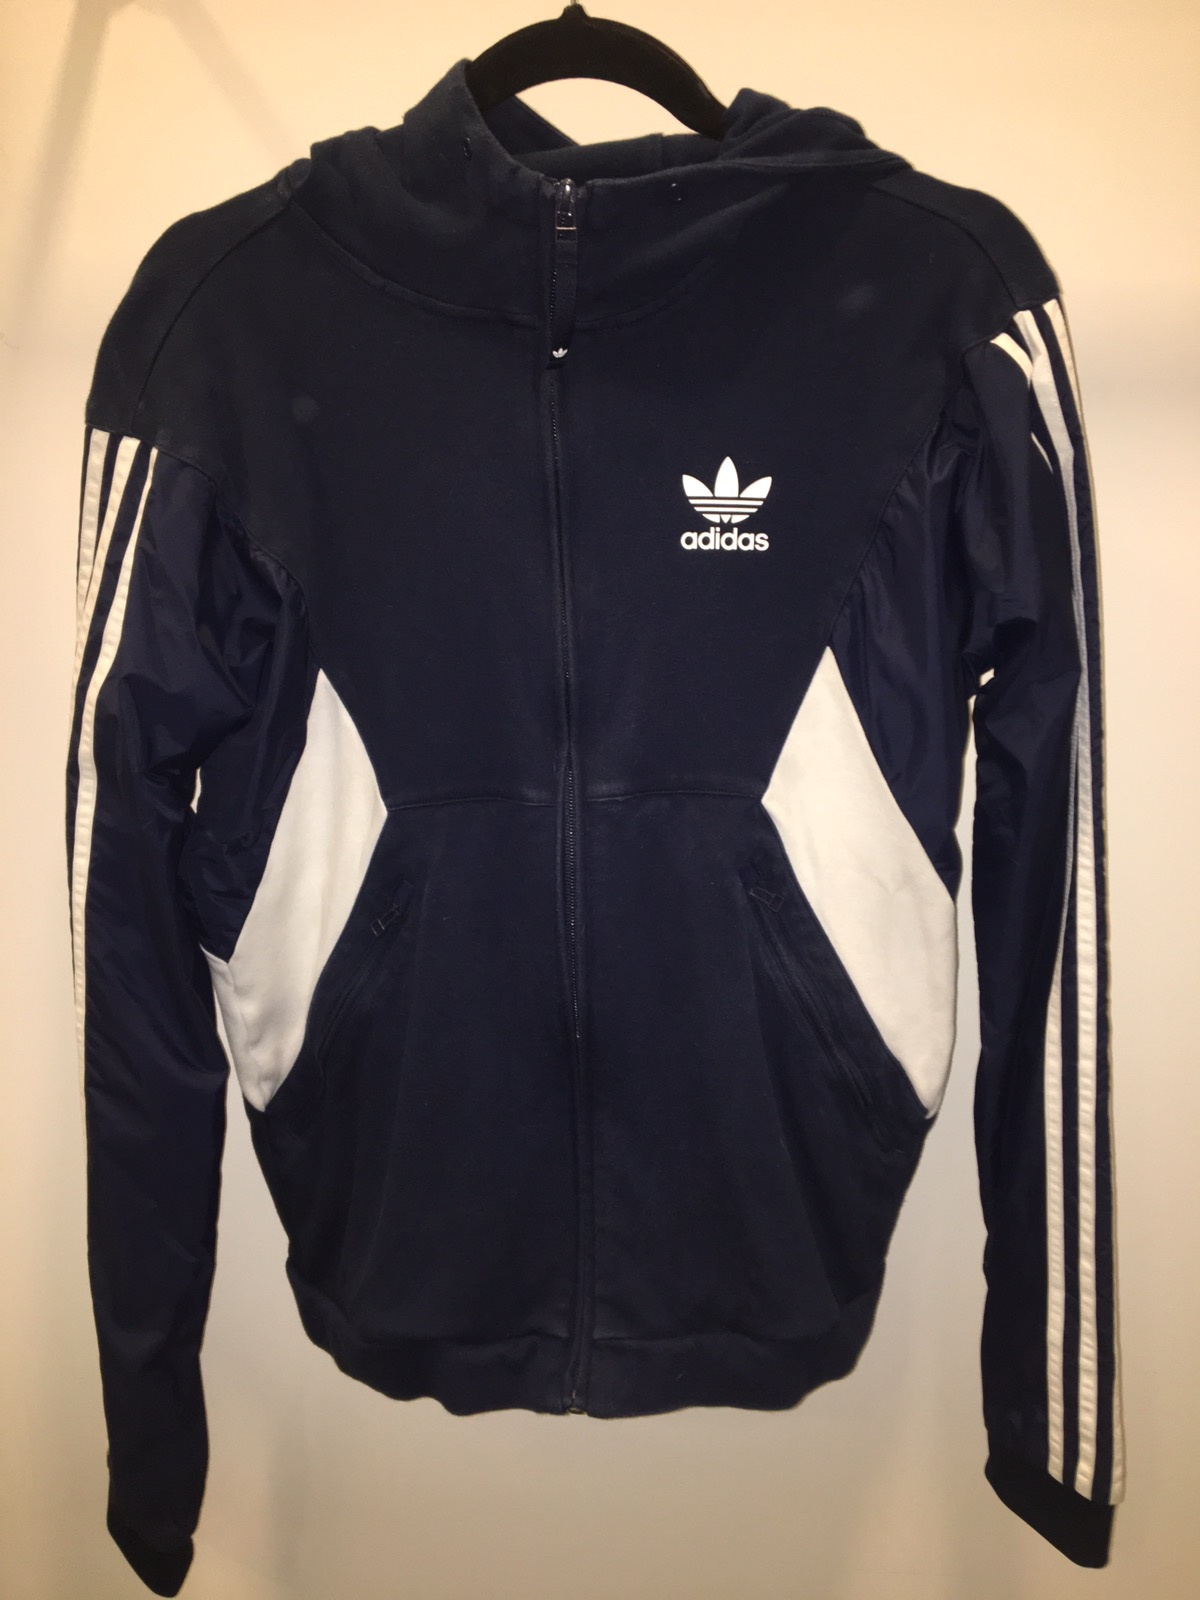 Black and blue adidas track jacket